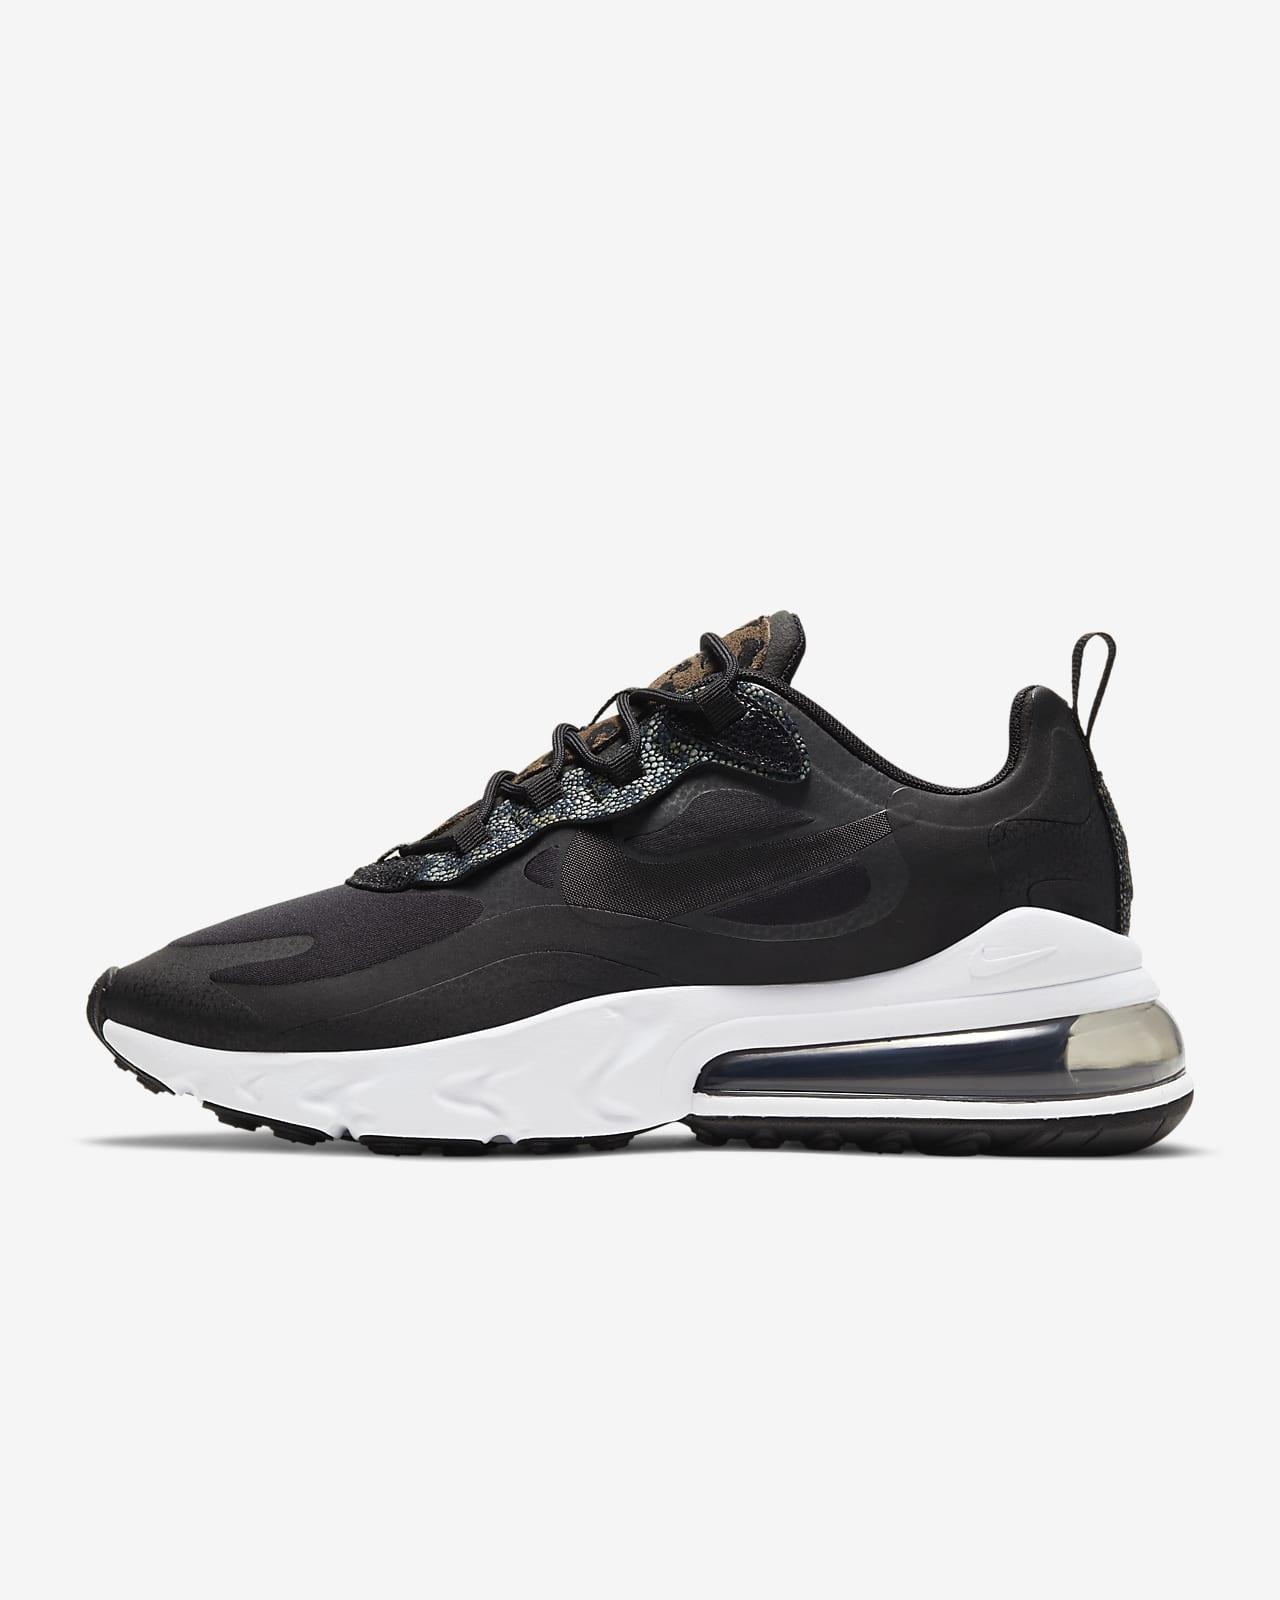 Nike Air Max 270 React SE Women's Shoe